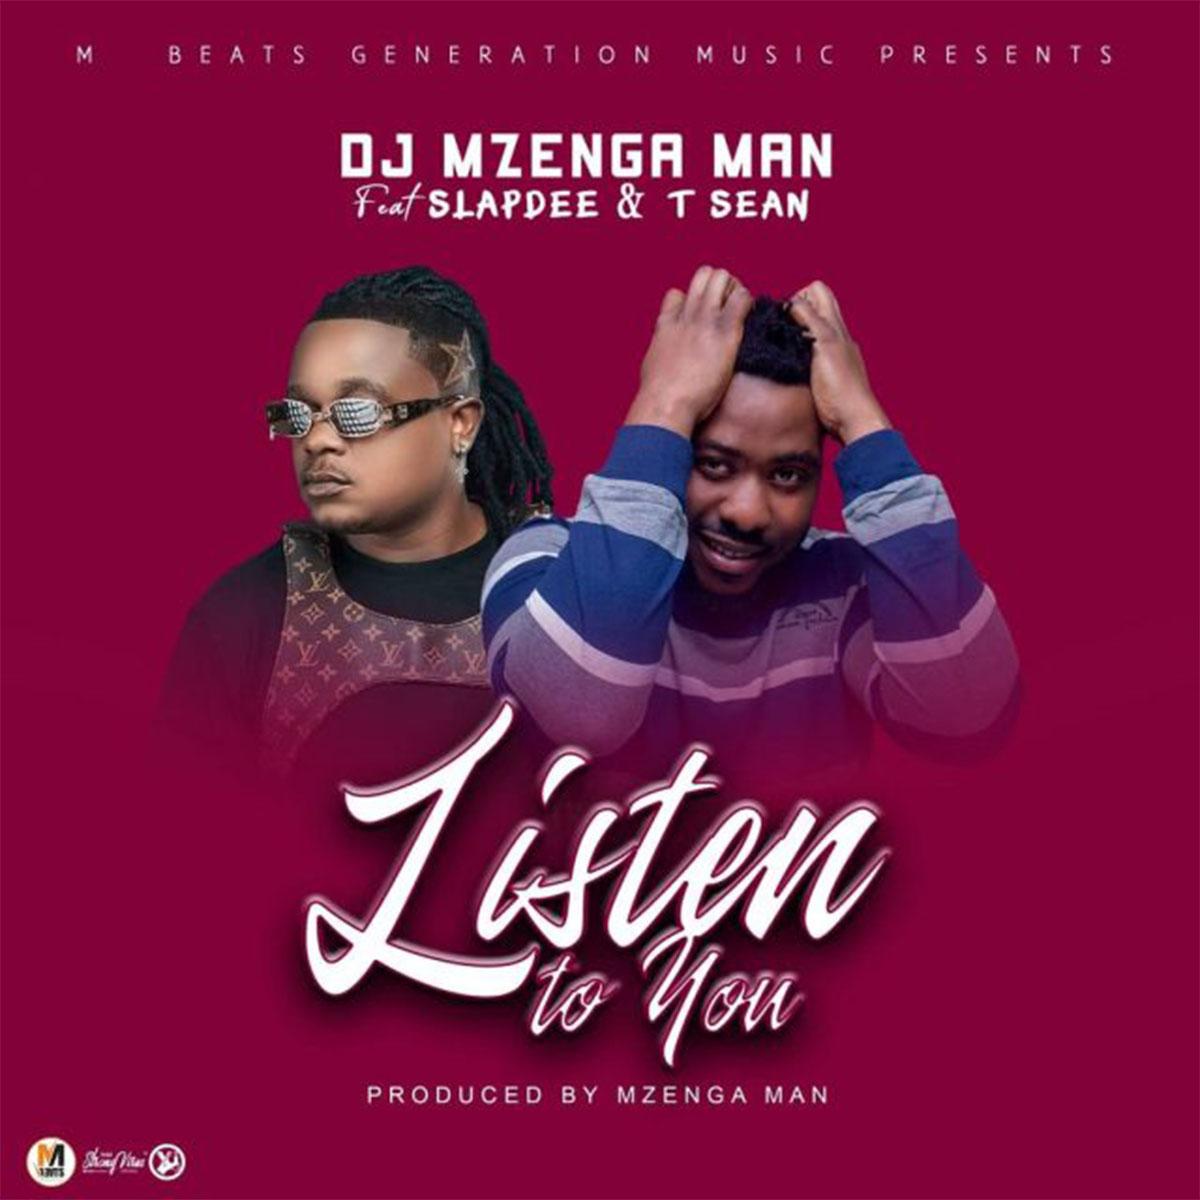 DJ Mzenga Man ft. Slapdee & T-Sean - Listen To You (Lyric Video)